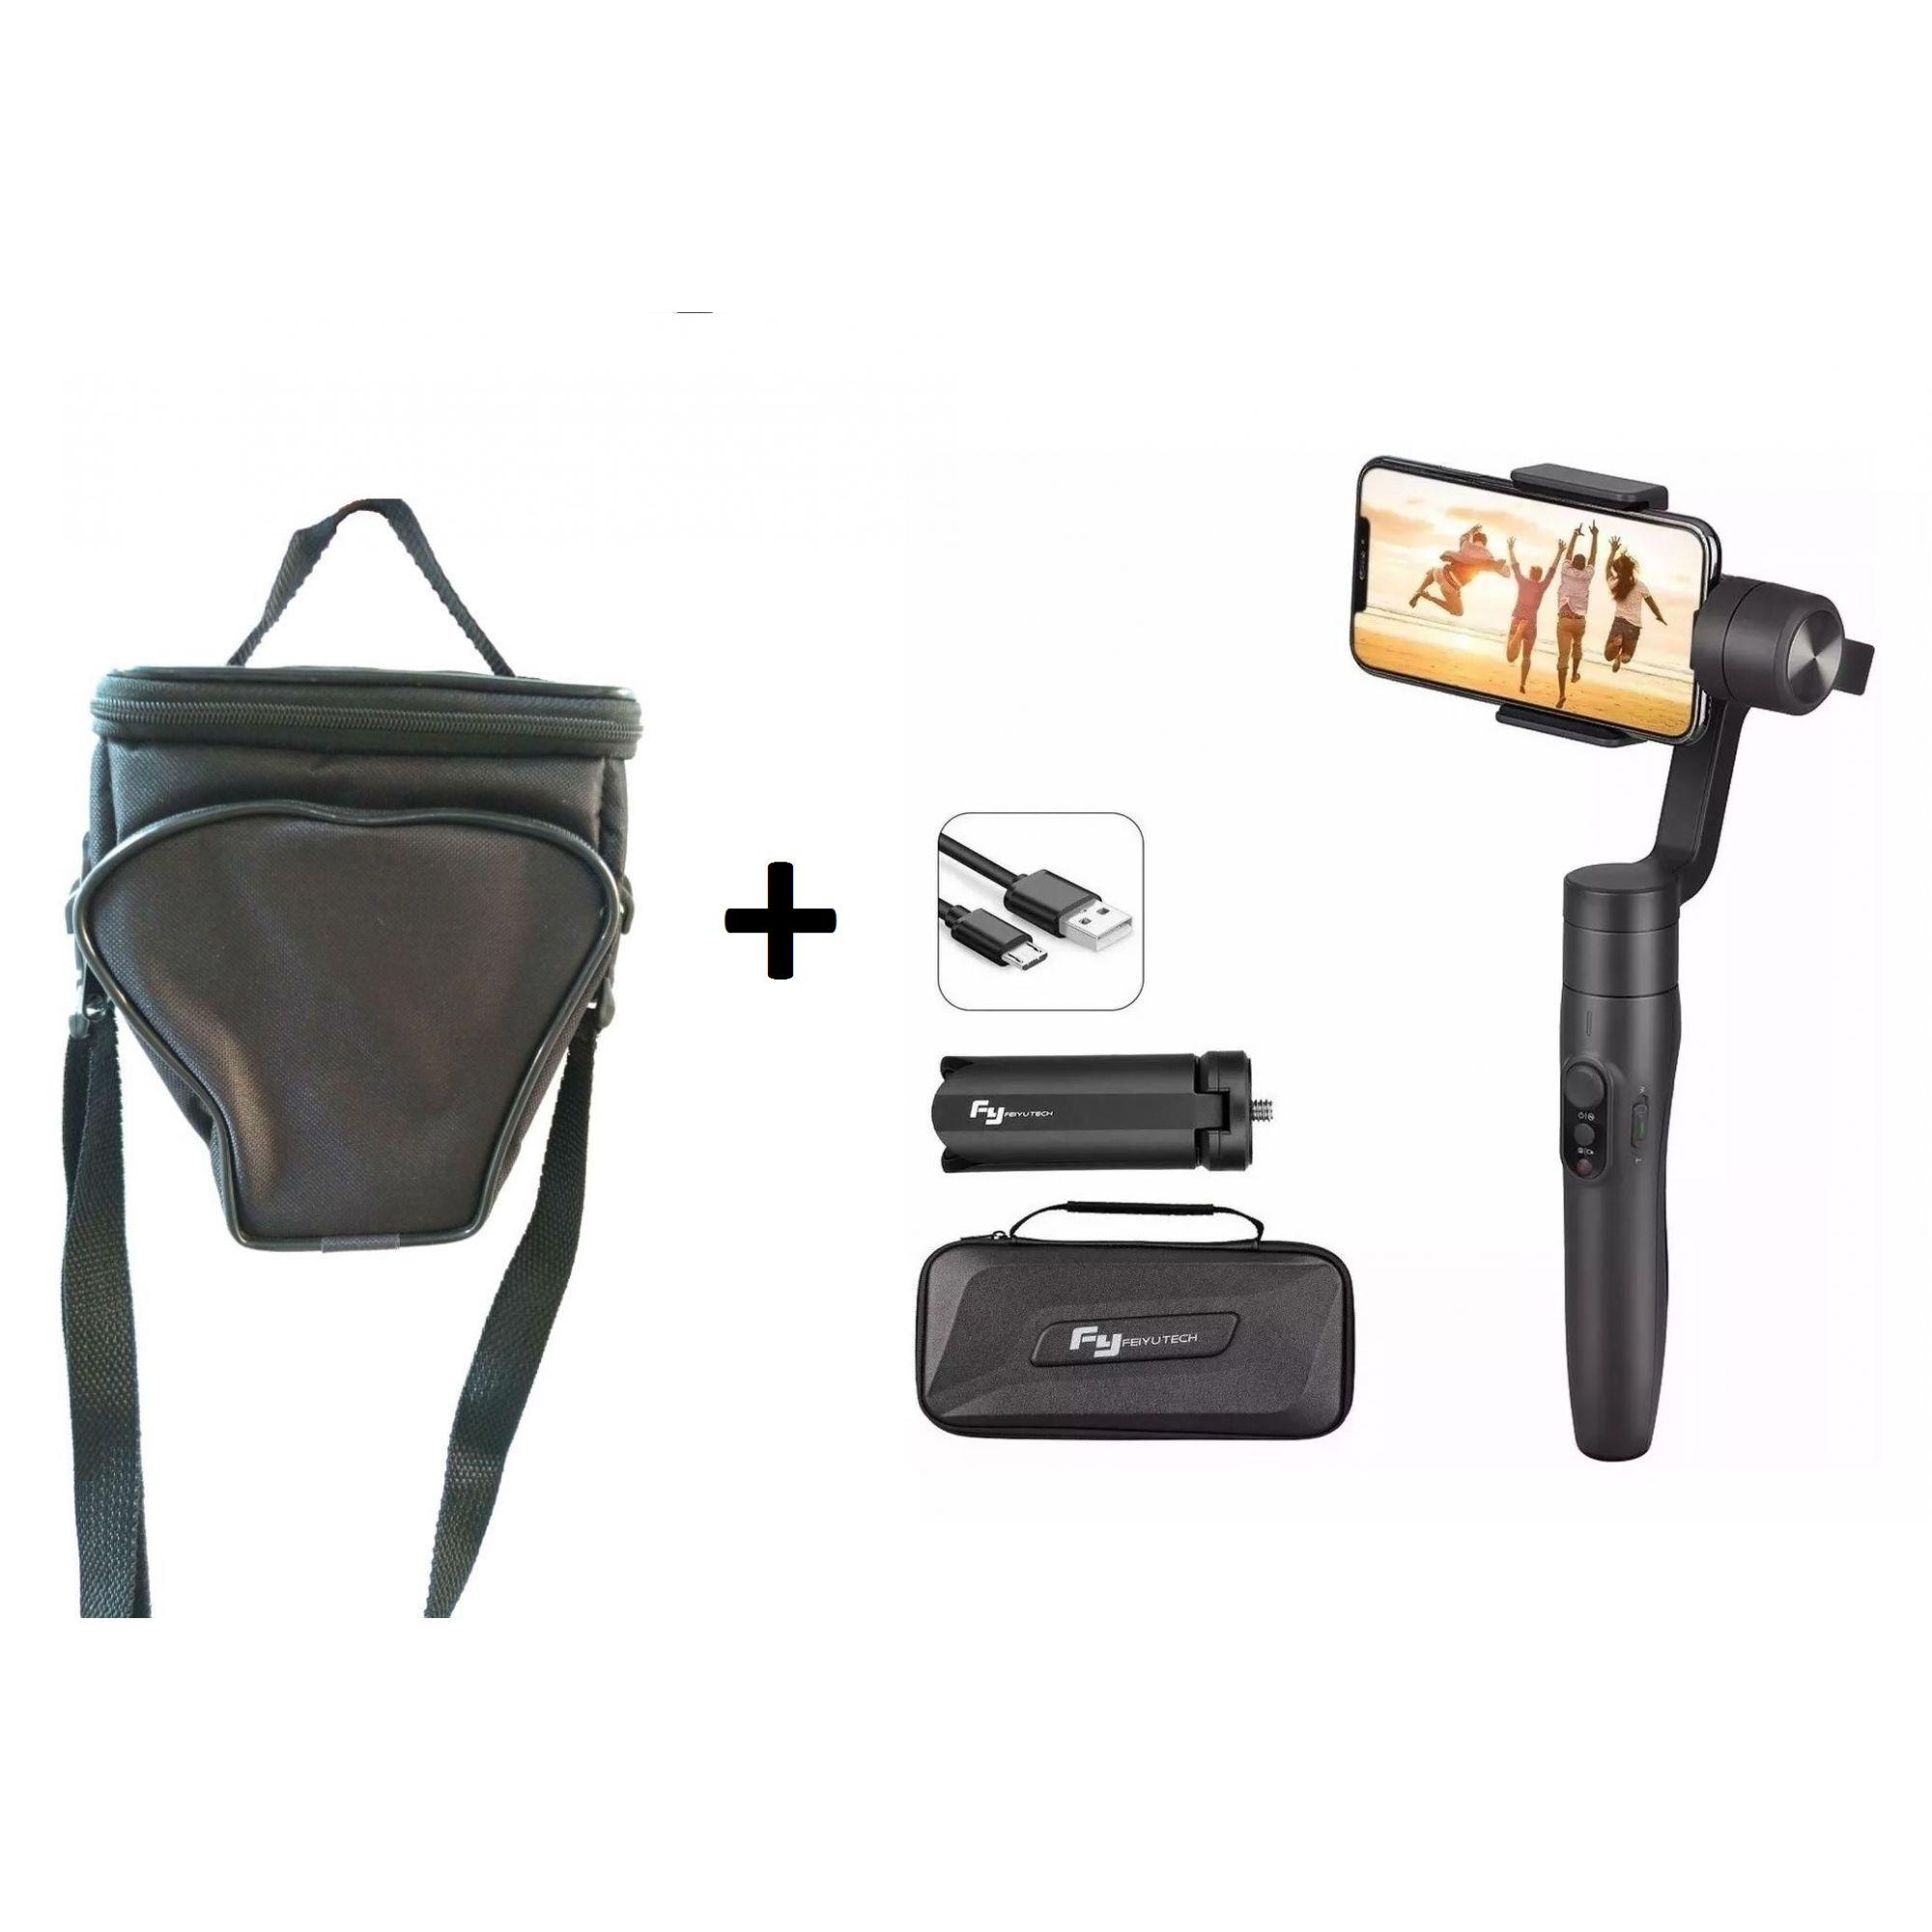 Kit Gimbal Estabilizador Para Câmera + Bolsa Para Câmera - FI0382+ISA1